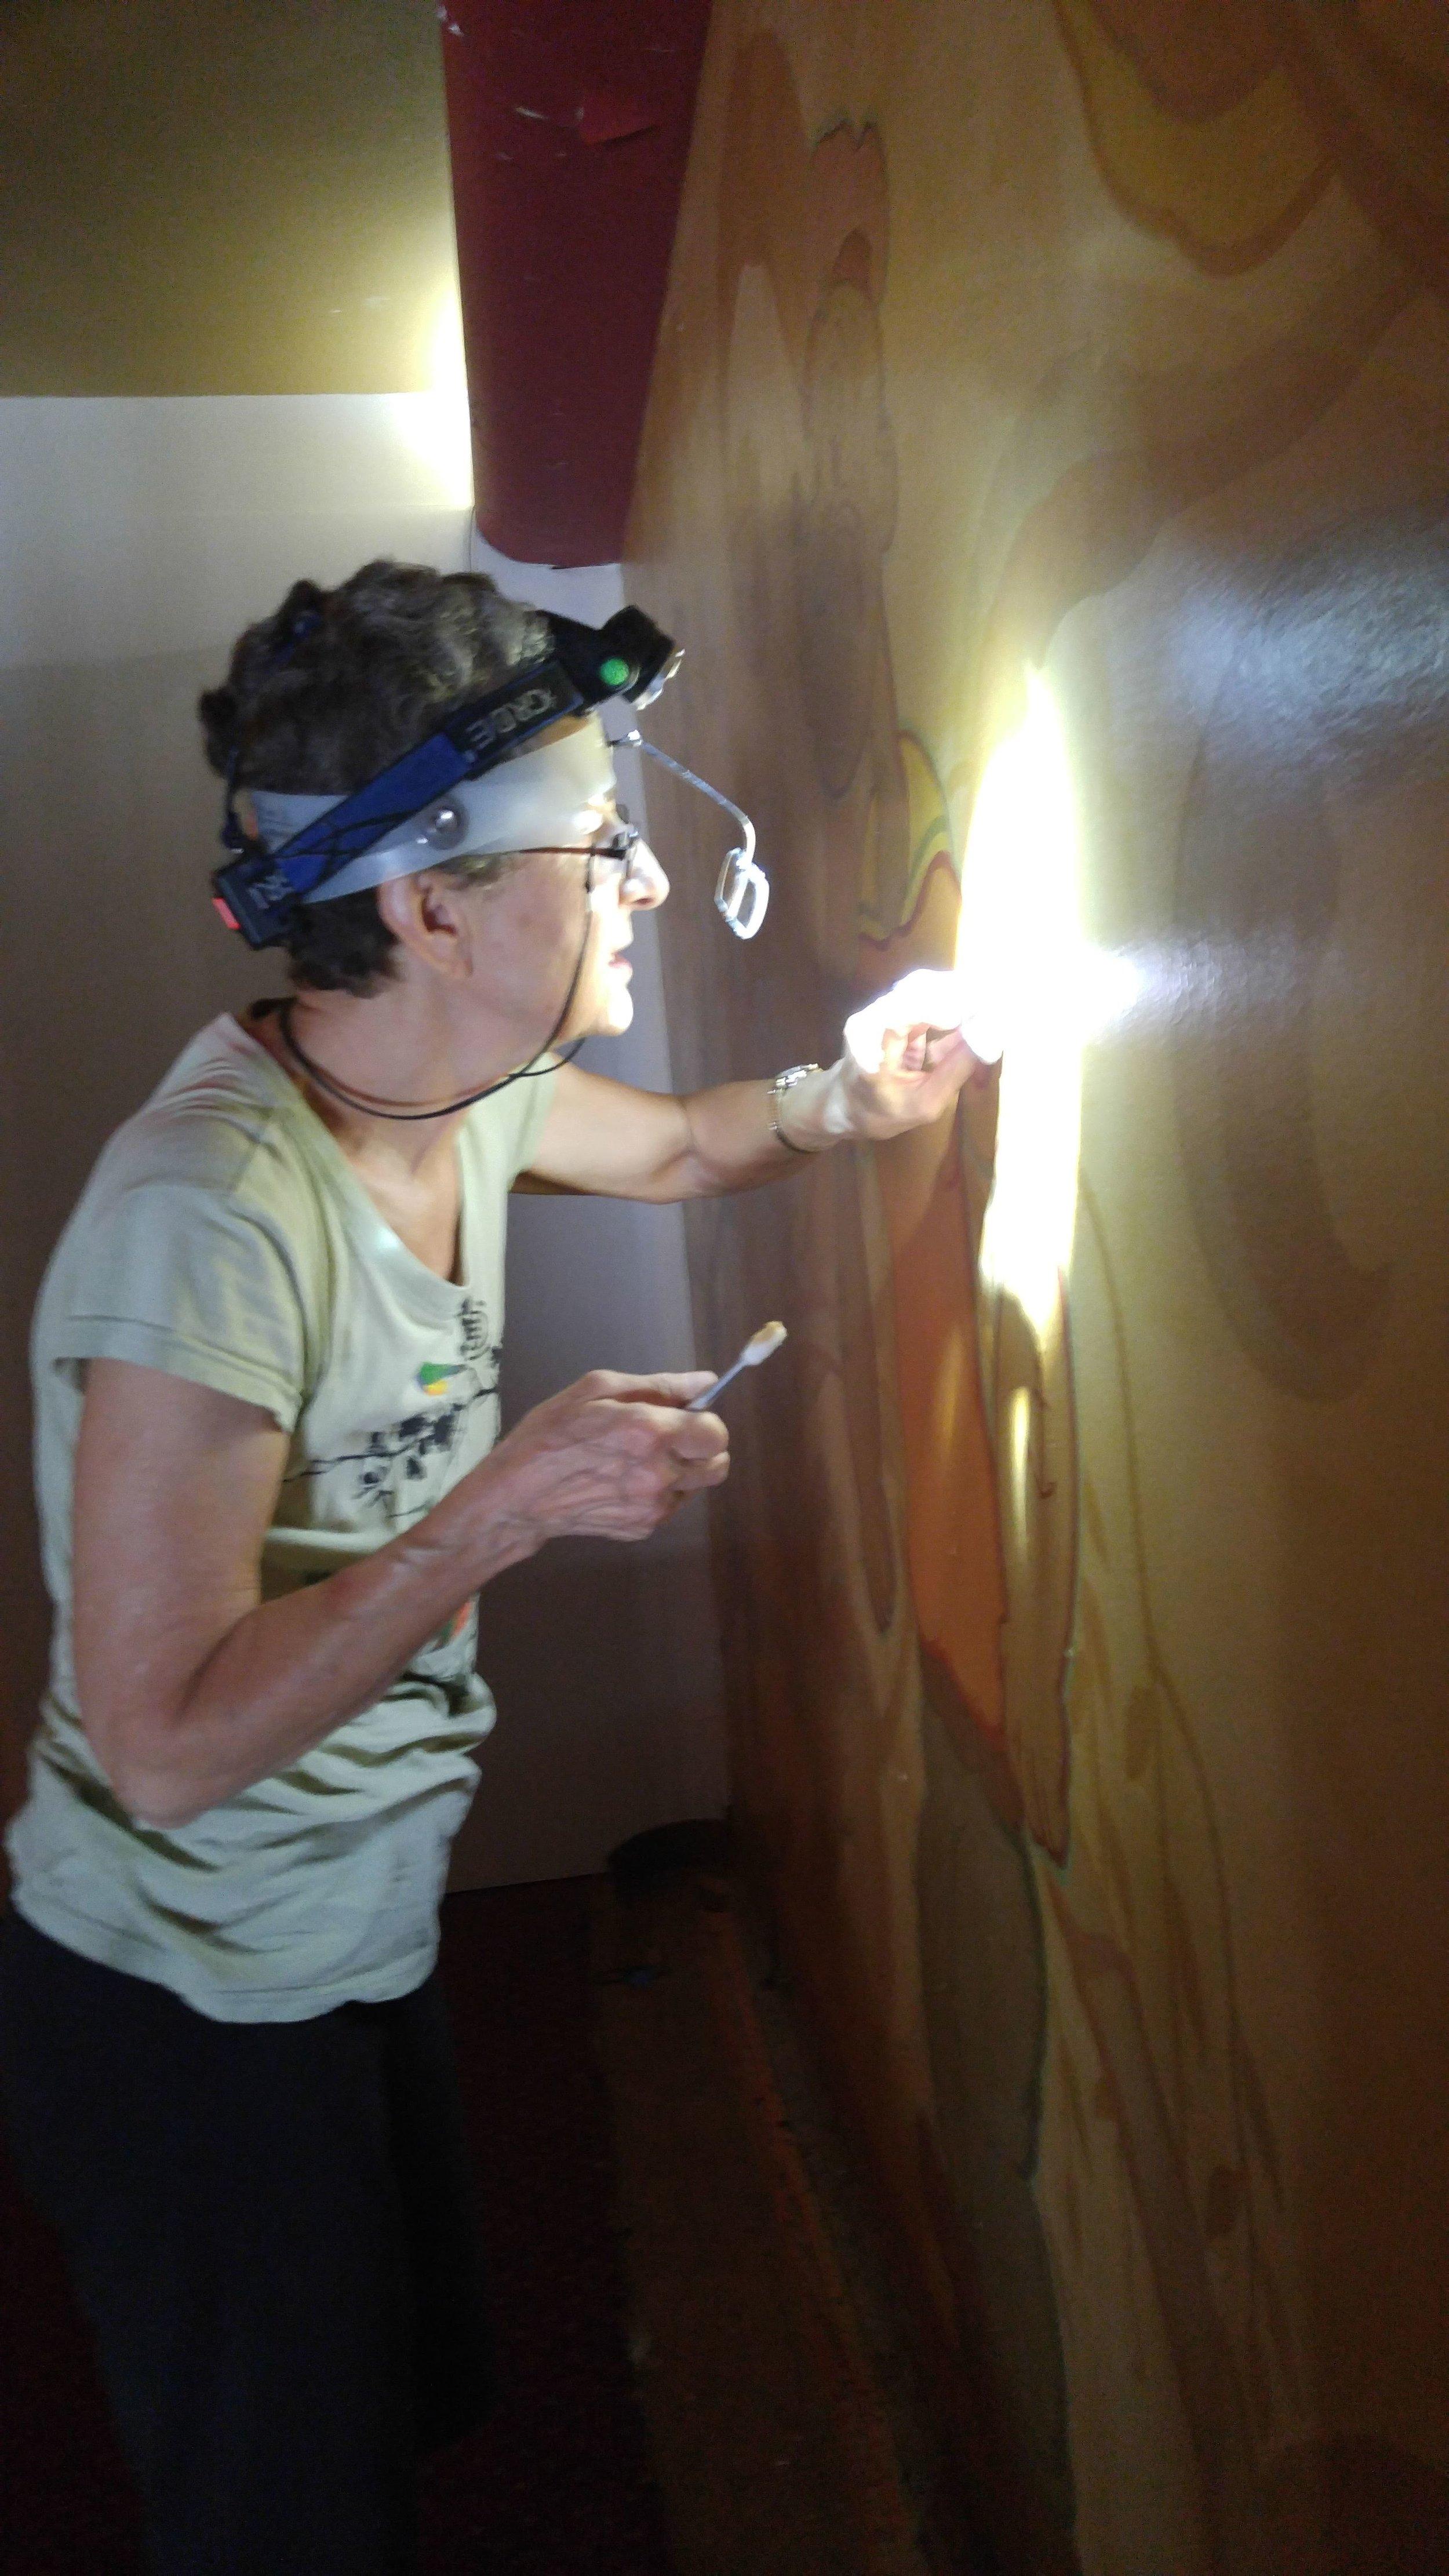 Decorative arts conservator Stashka Star examines the murals.